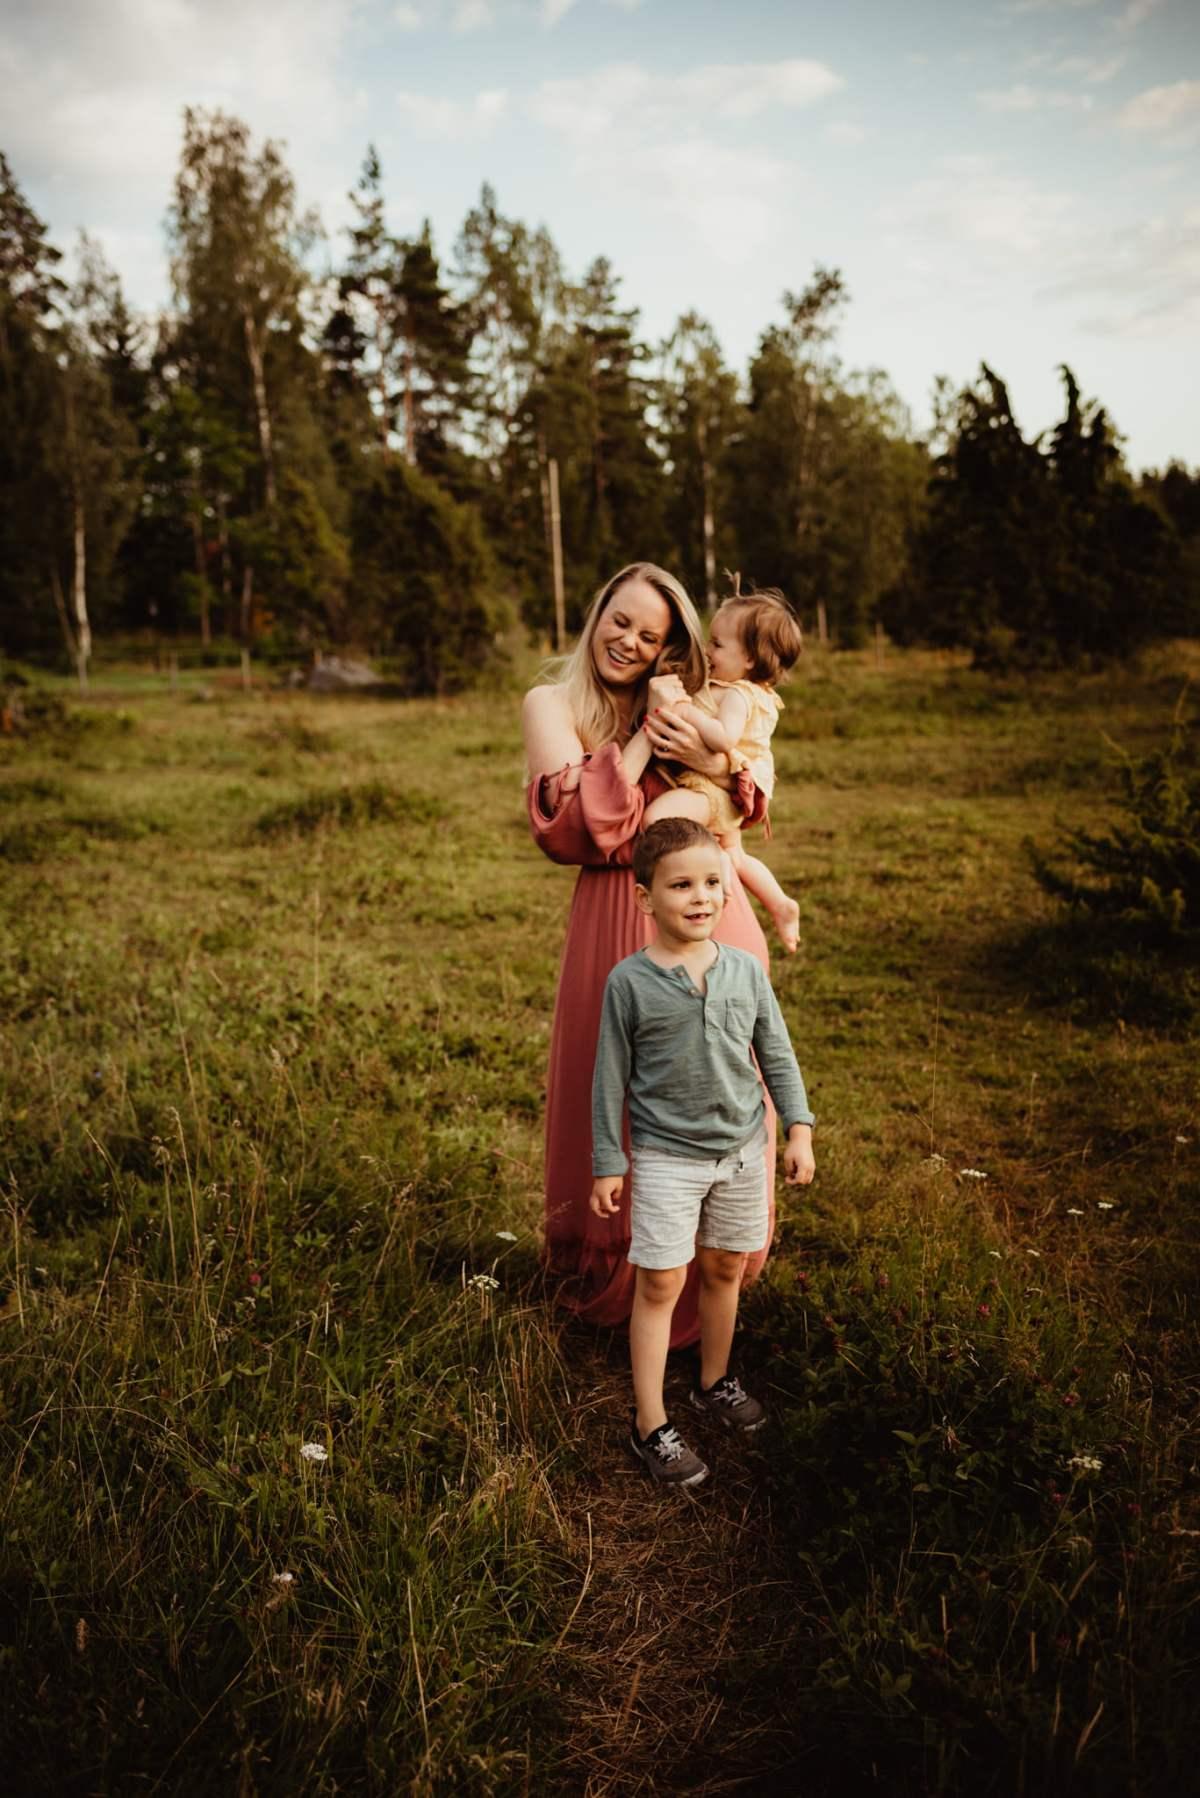 Familjefotografering Stockholm - Jasmine 17